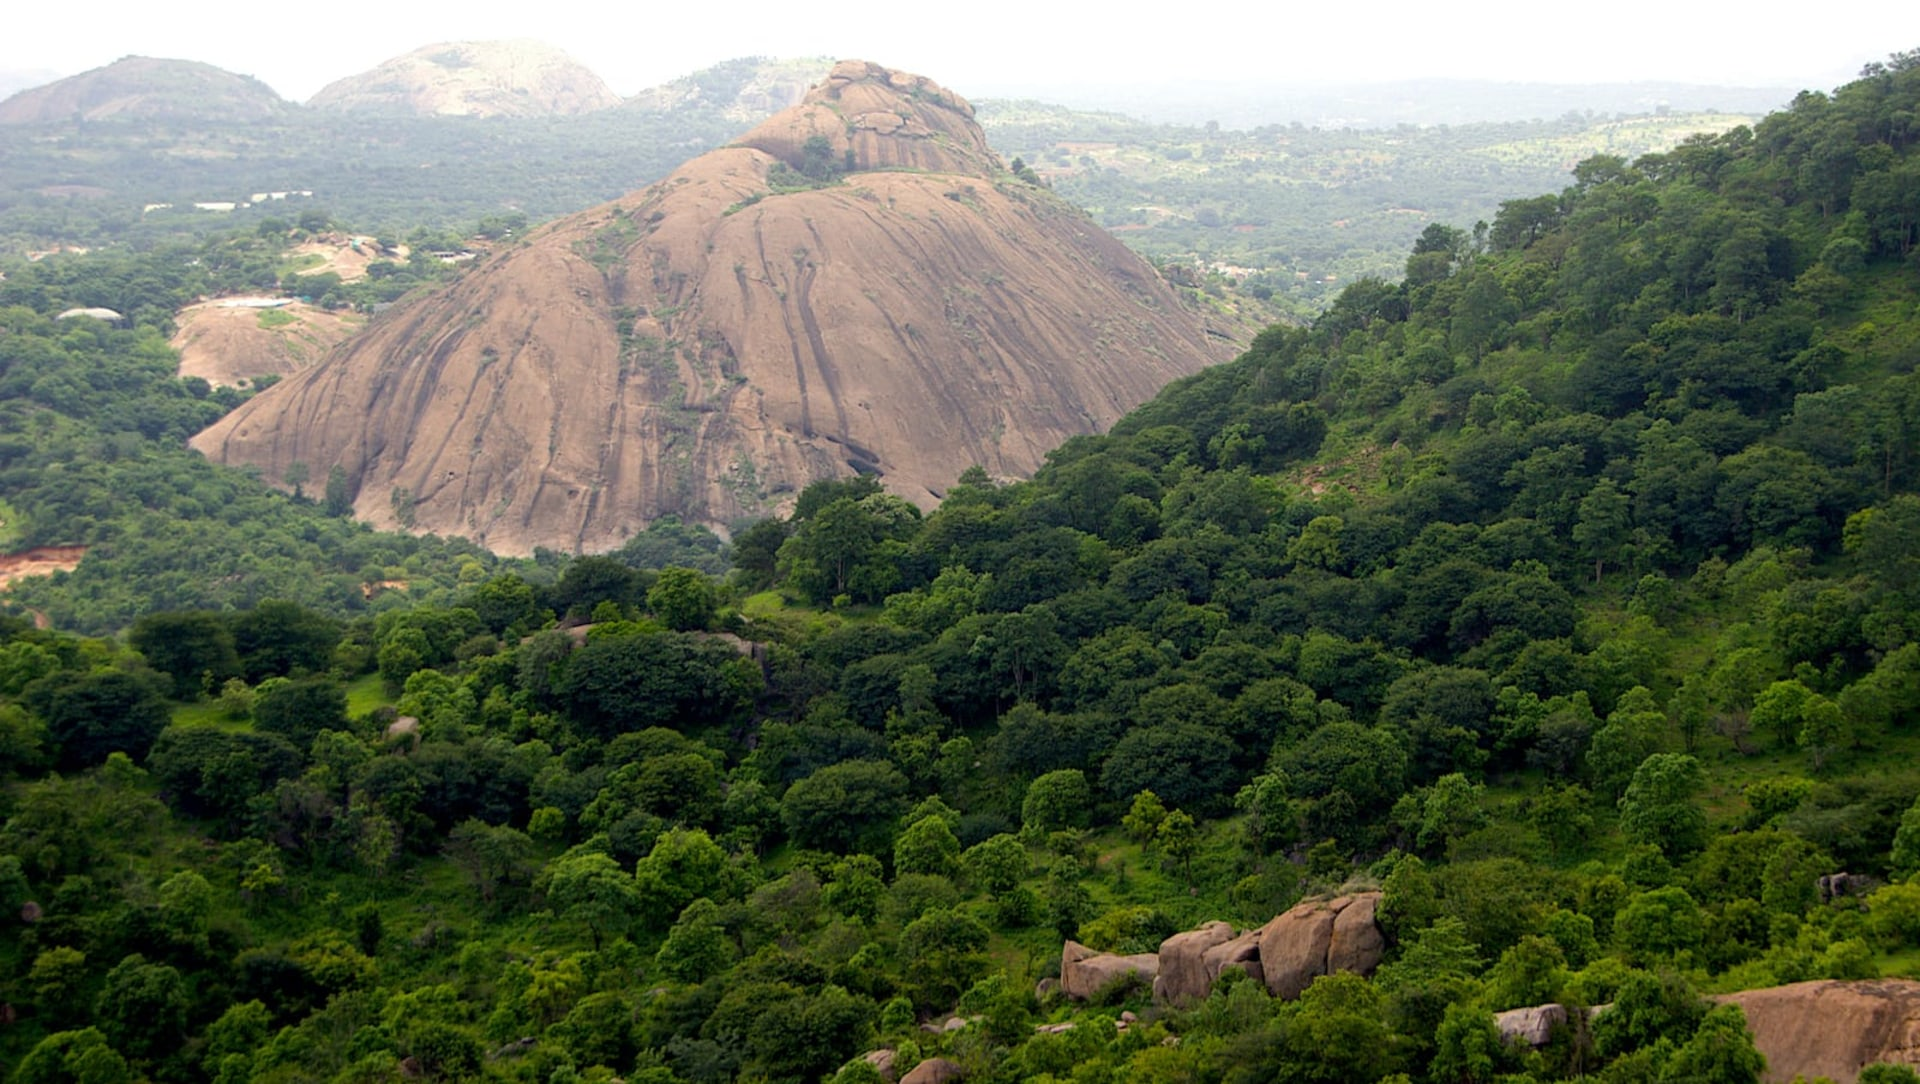 Ramadevarabetta: A Vulture Sanctuary in Rapidly Urbanising Ramanagara